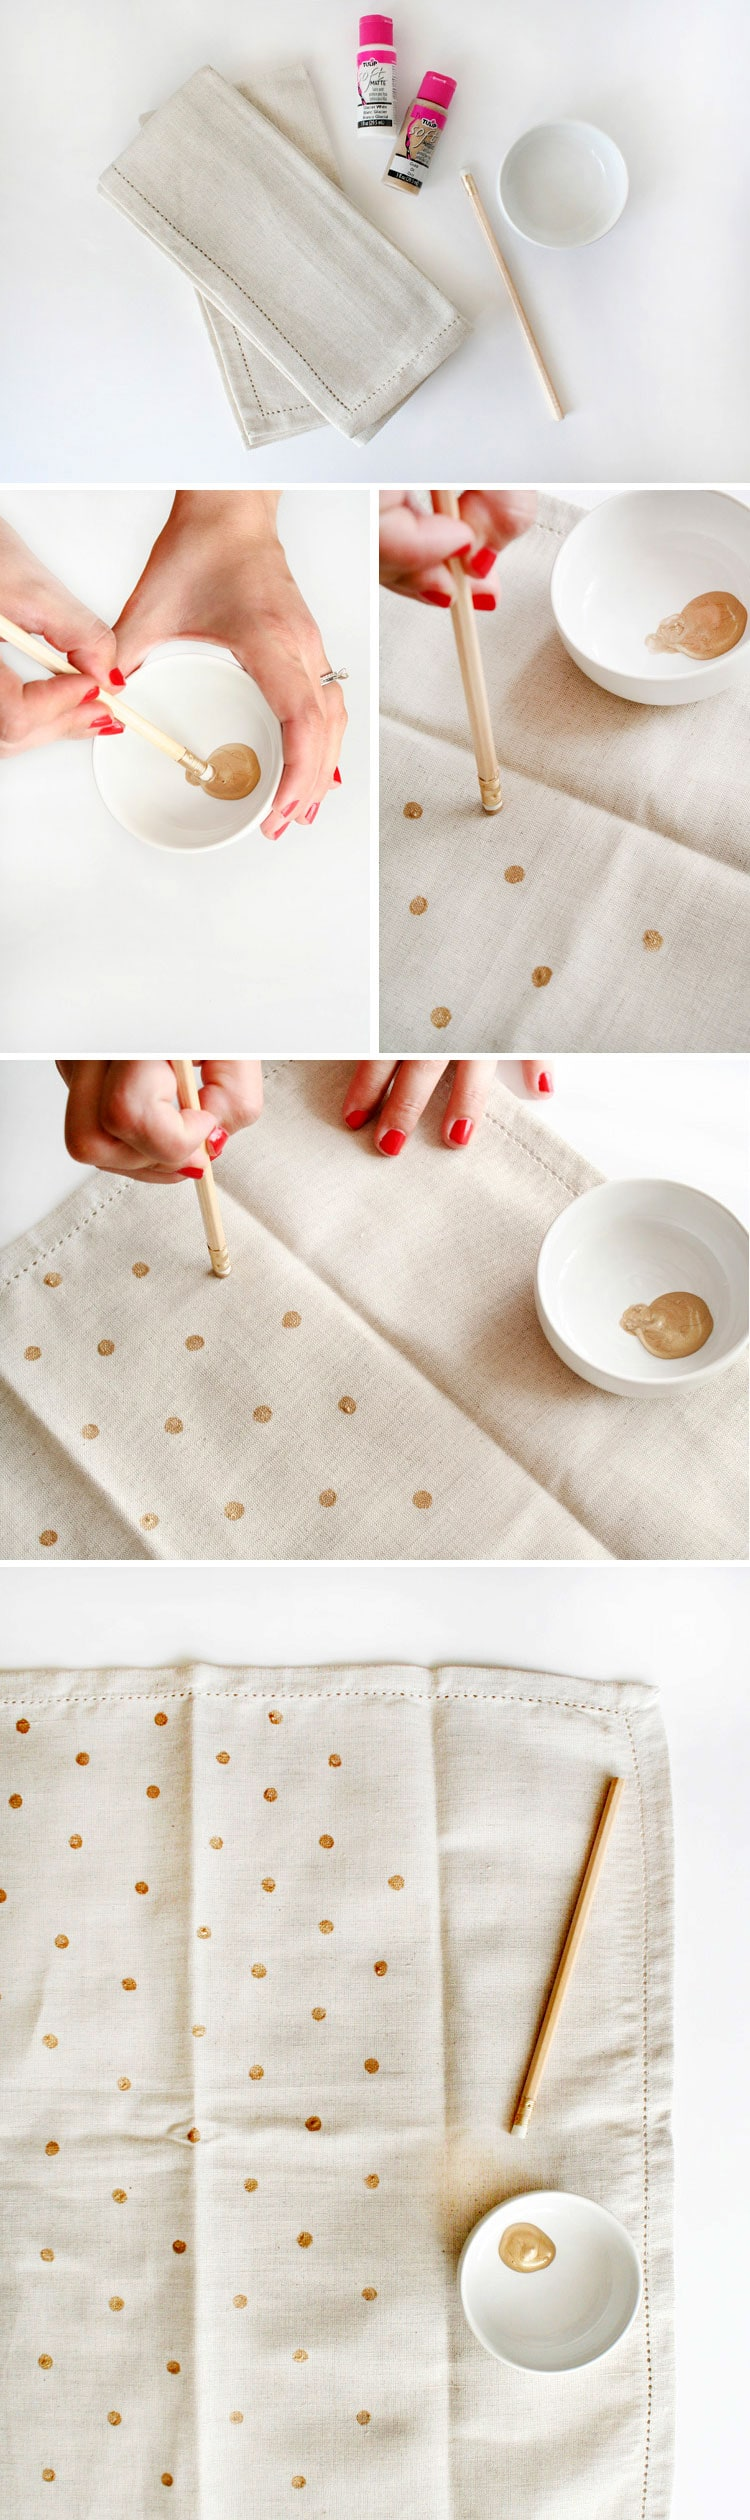 Polka dot napkin tutorial  sc 1 st  Freutcake & DIY Polka Dot Napkins